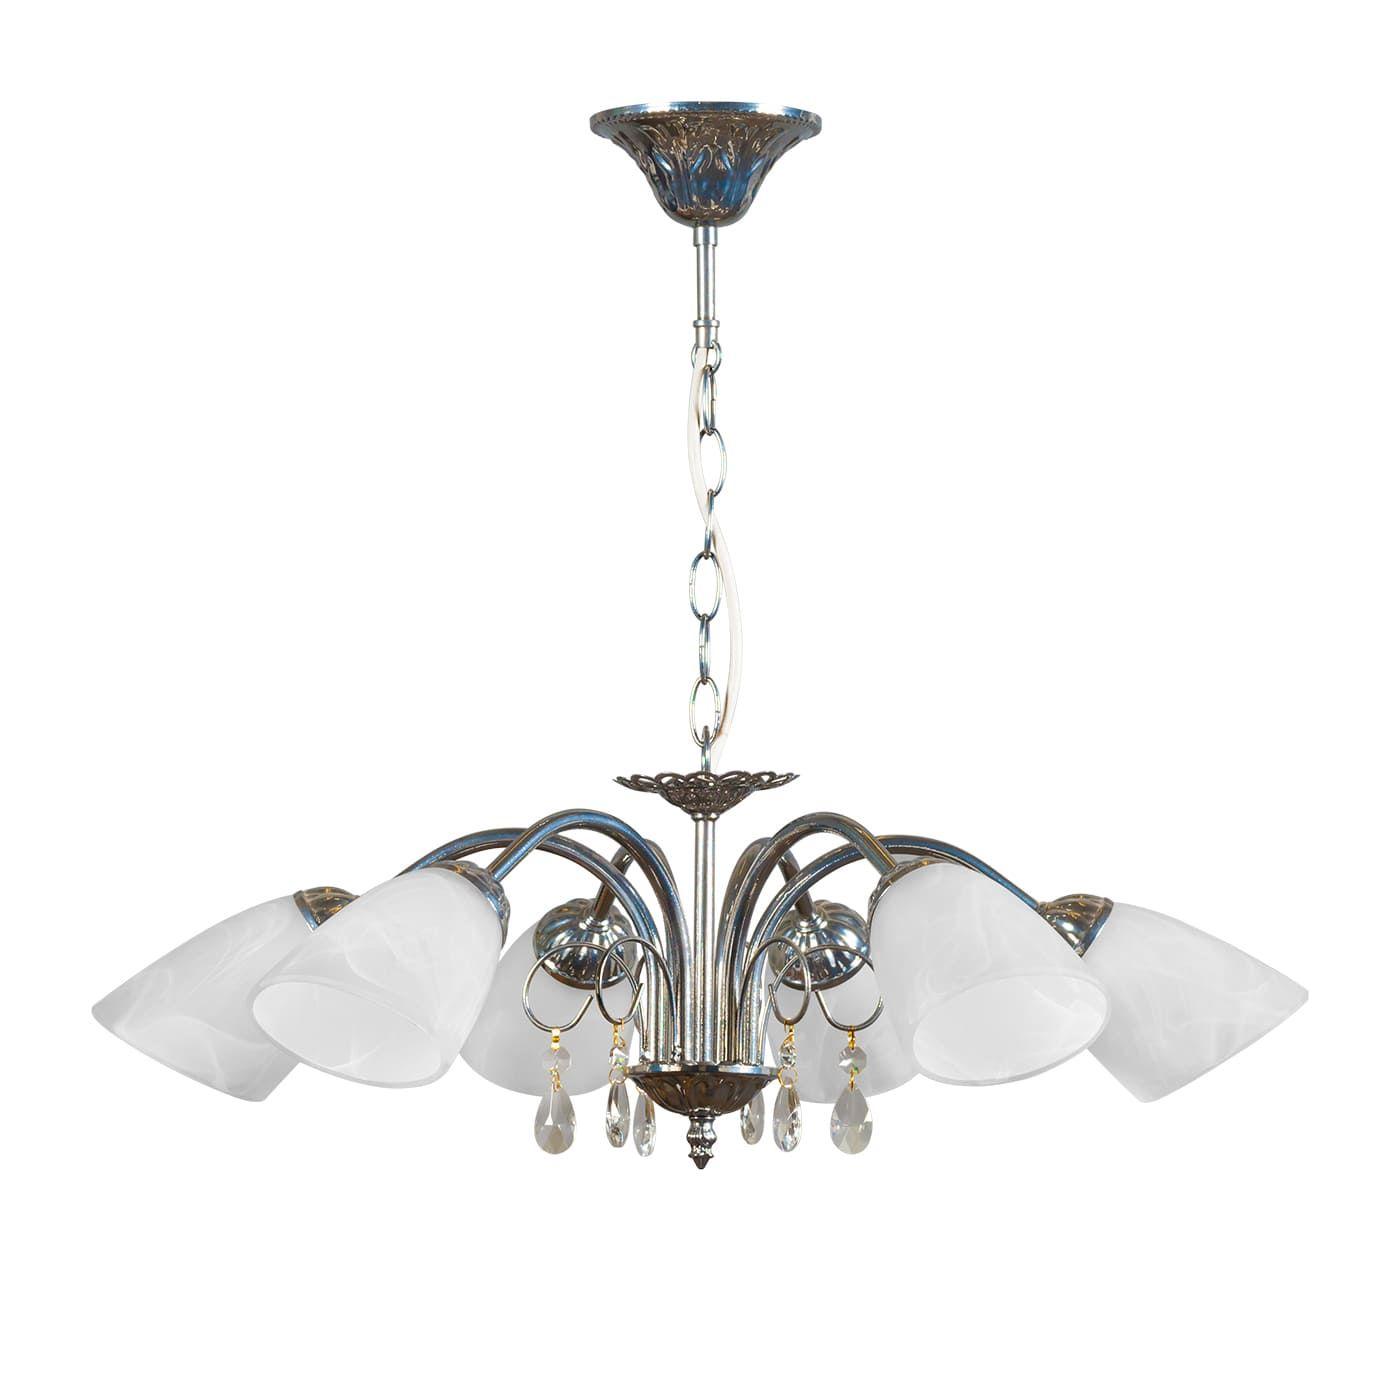 PETRASVET / Pendant chandelier S2004-6, 6xE14 max. 60W